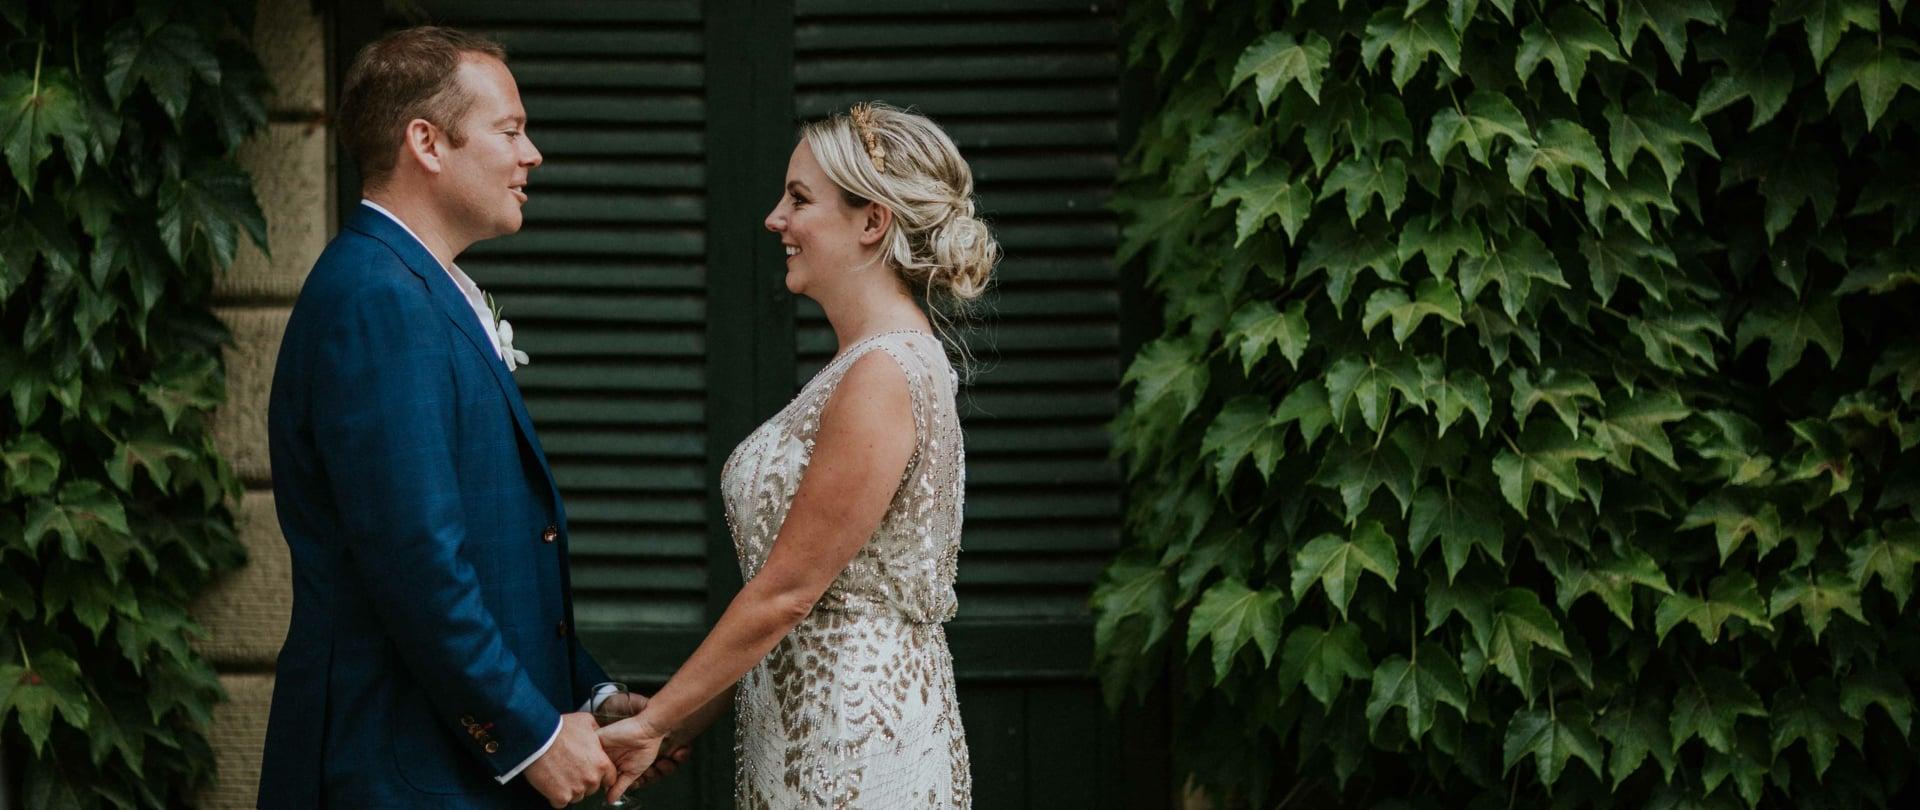 Bec & James Wedding Video Filmed at Tuscany, Italy